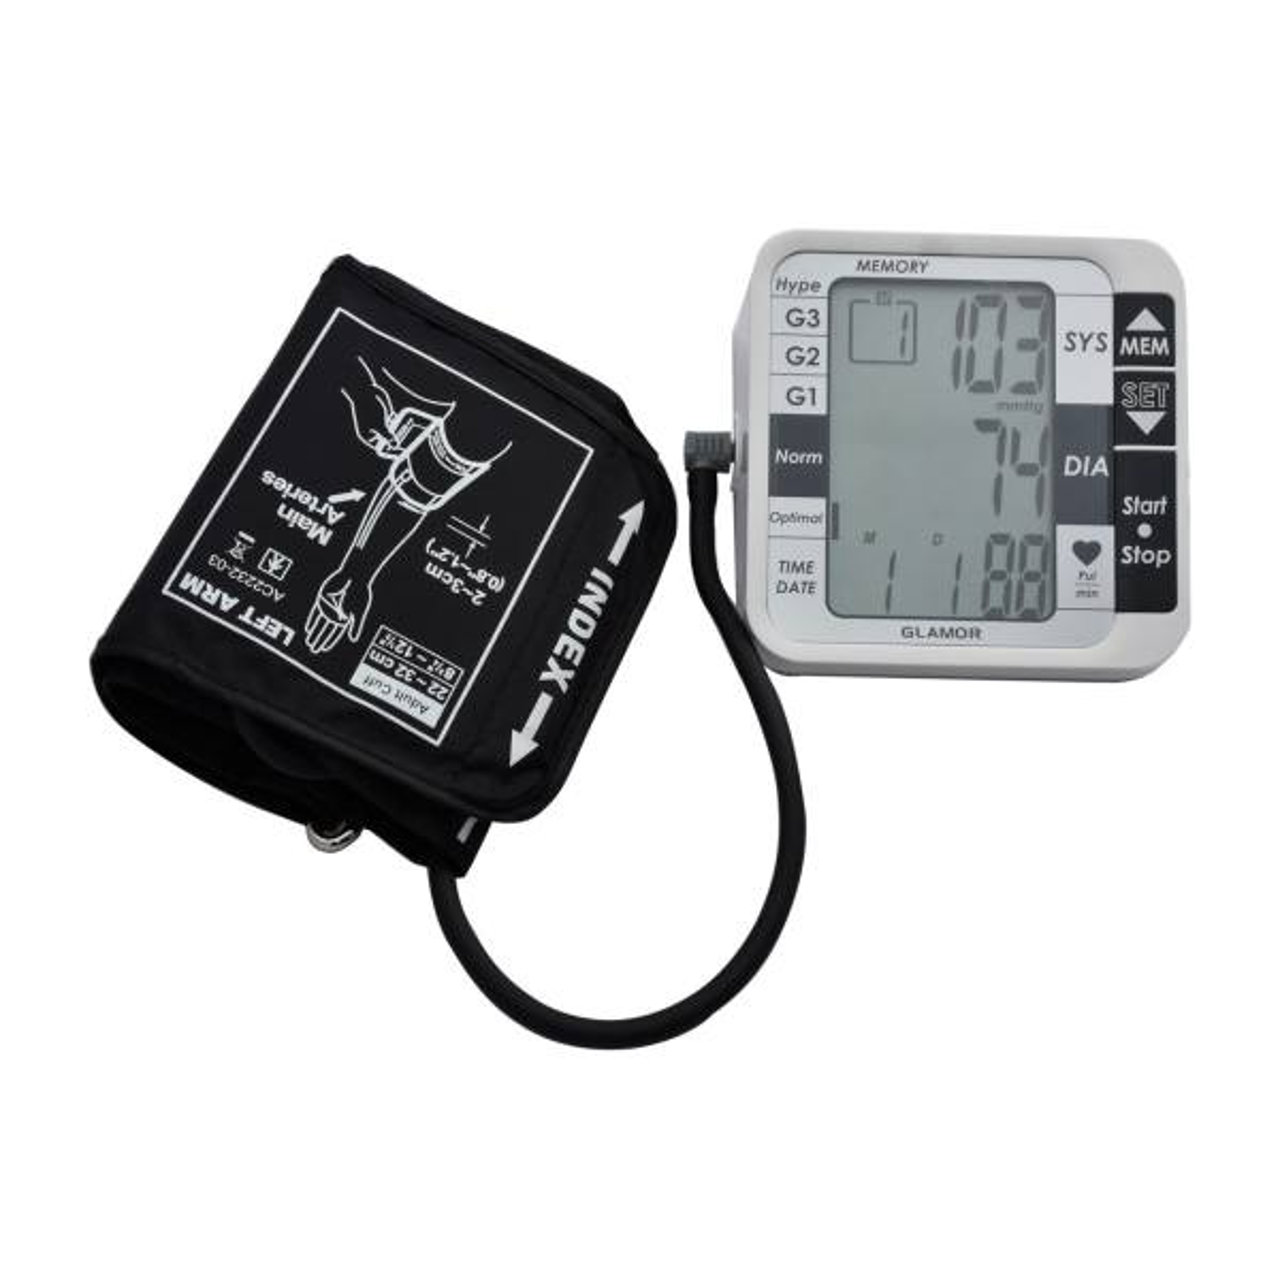 فشارسنج هایتک مدل TMB-1112A | Hi-Tec TMB-1112A Blood Pressure Monitor